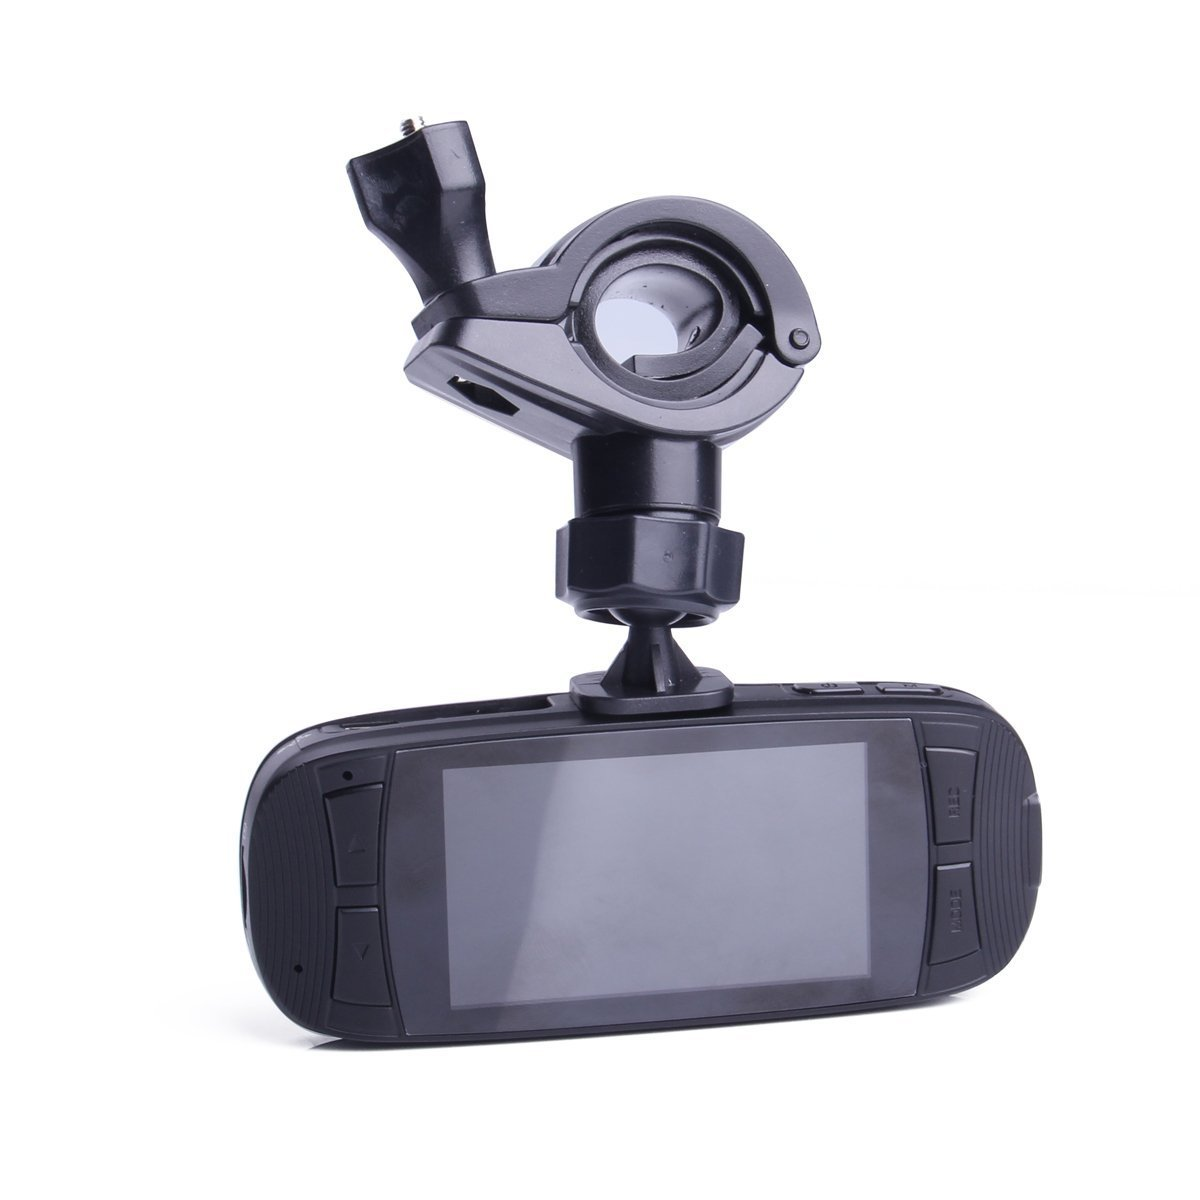 Sony IMX323 Car Dash Camera VIOFO G1W-S 2017 With GPS Receiver NT96650 Full 1080P HD Video /& Audio Recording Car DVR Camera Recorder G-Sensor Capabilities G1WSGPS